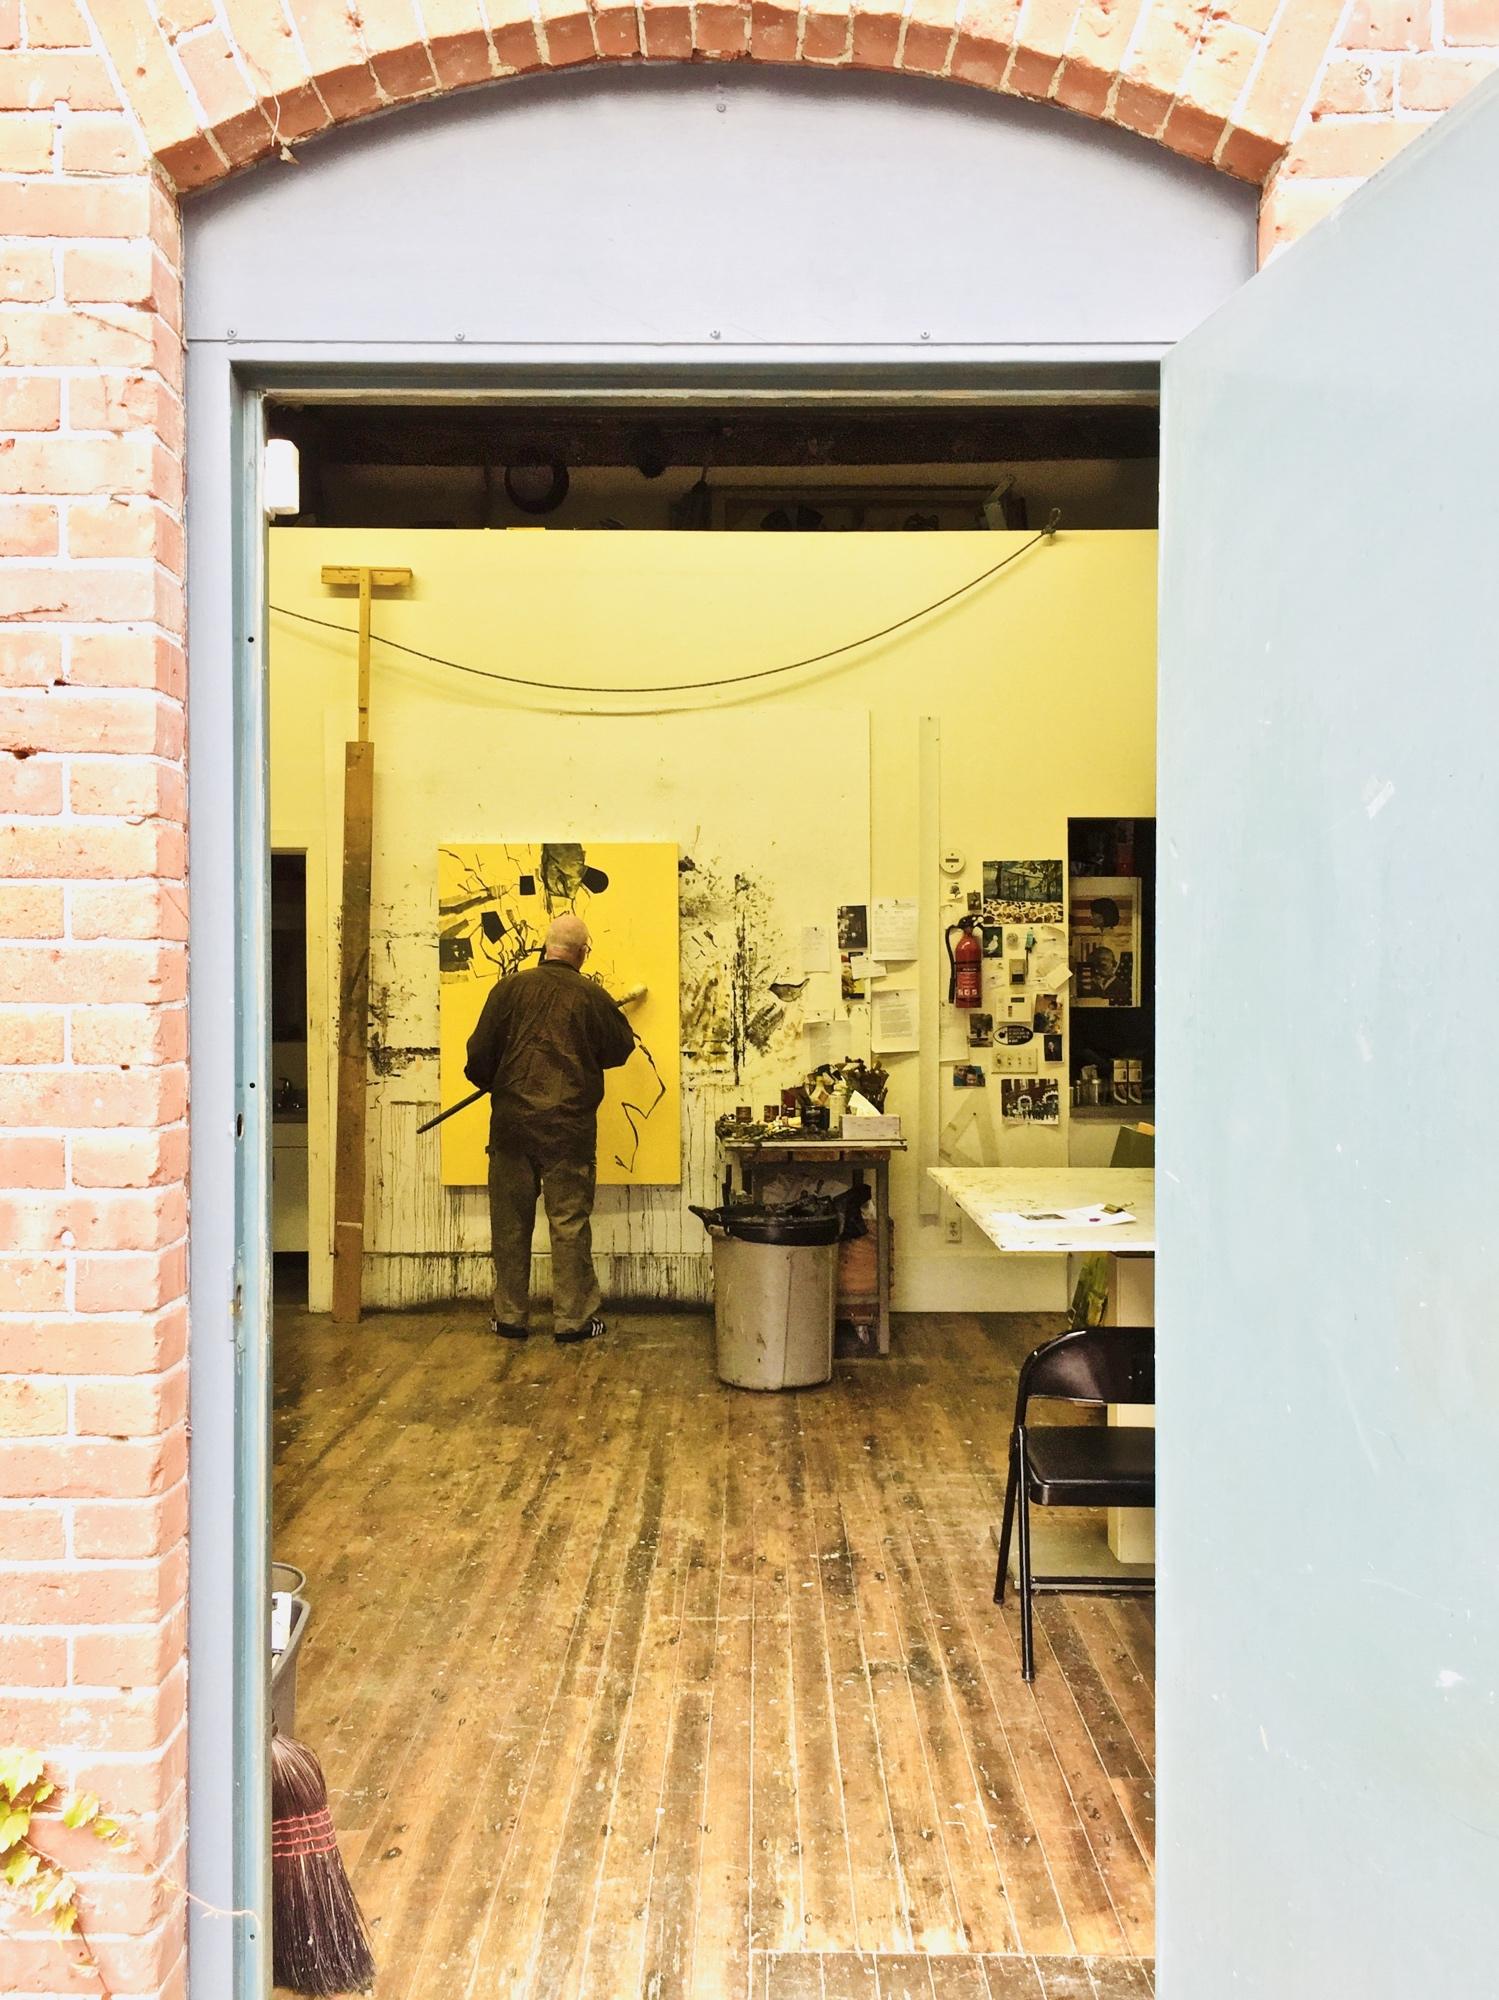 Artist David Frazer in his painting studio Photo by Barbra Revill